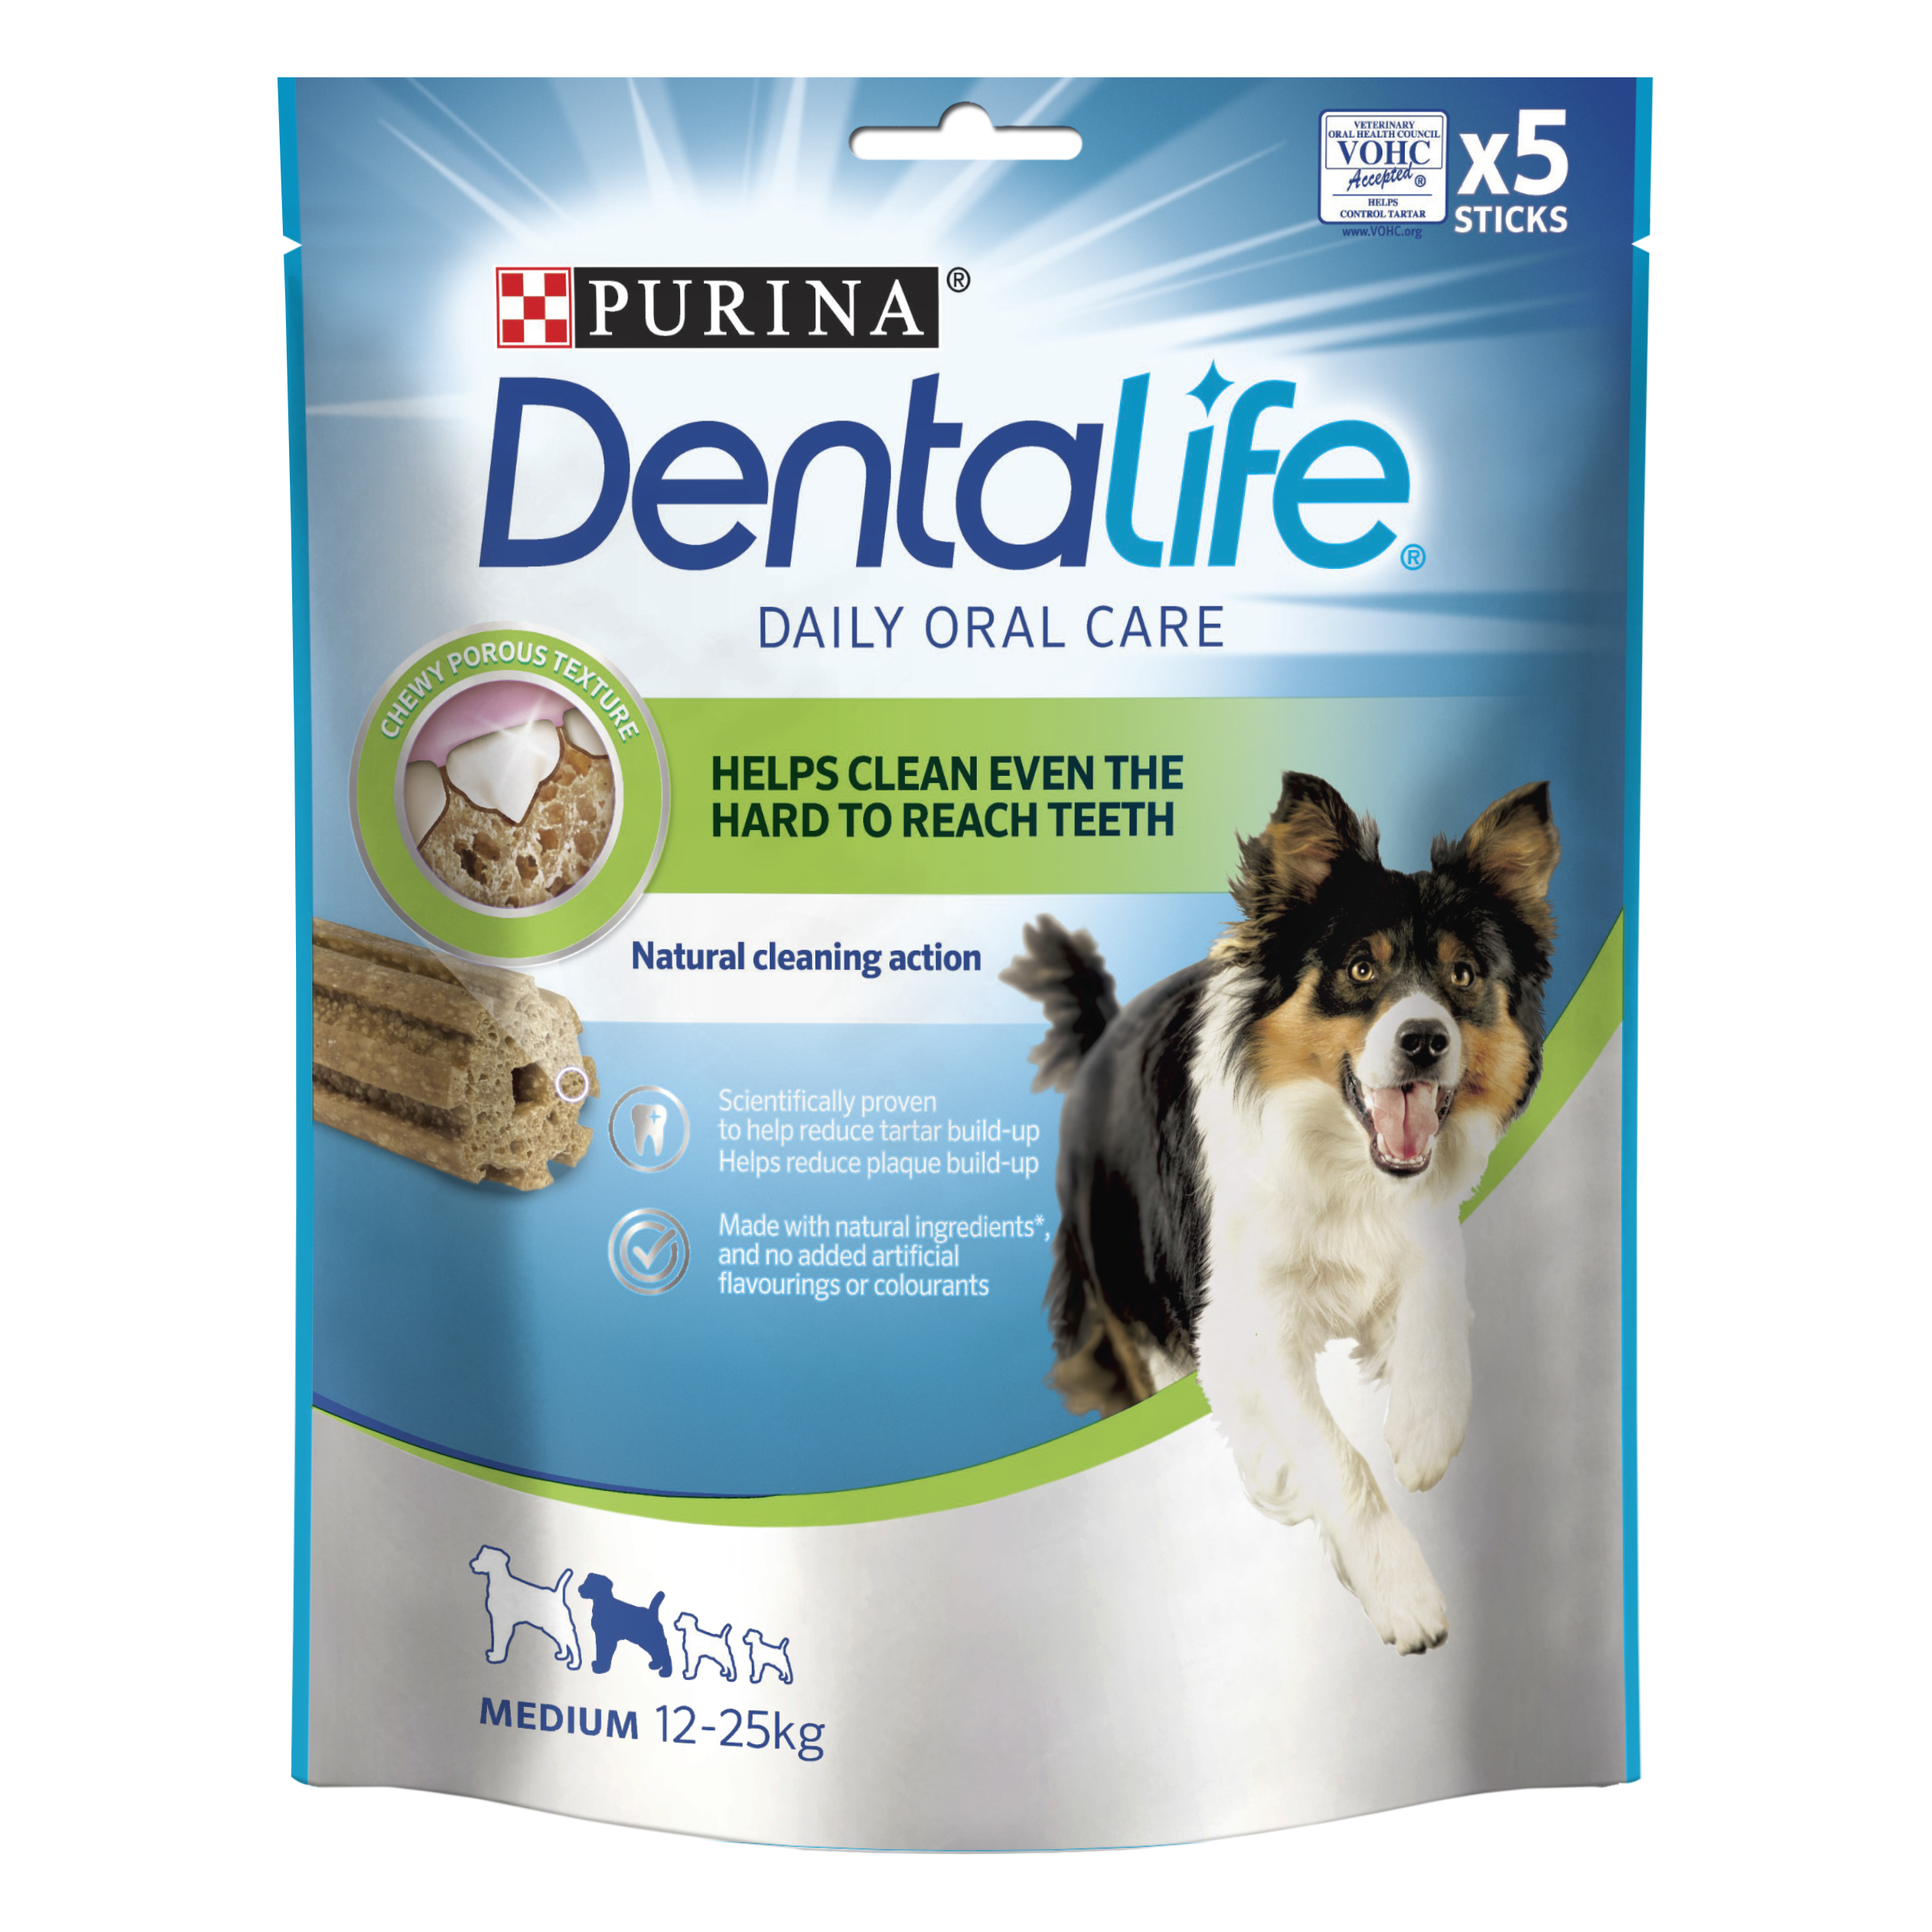 DentaLife tuggpinne Medium - 1 påse, 5 st tuggpinnar